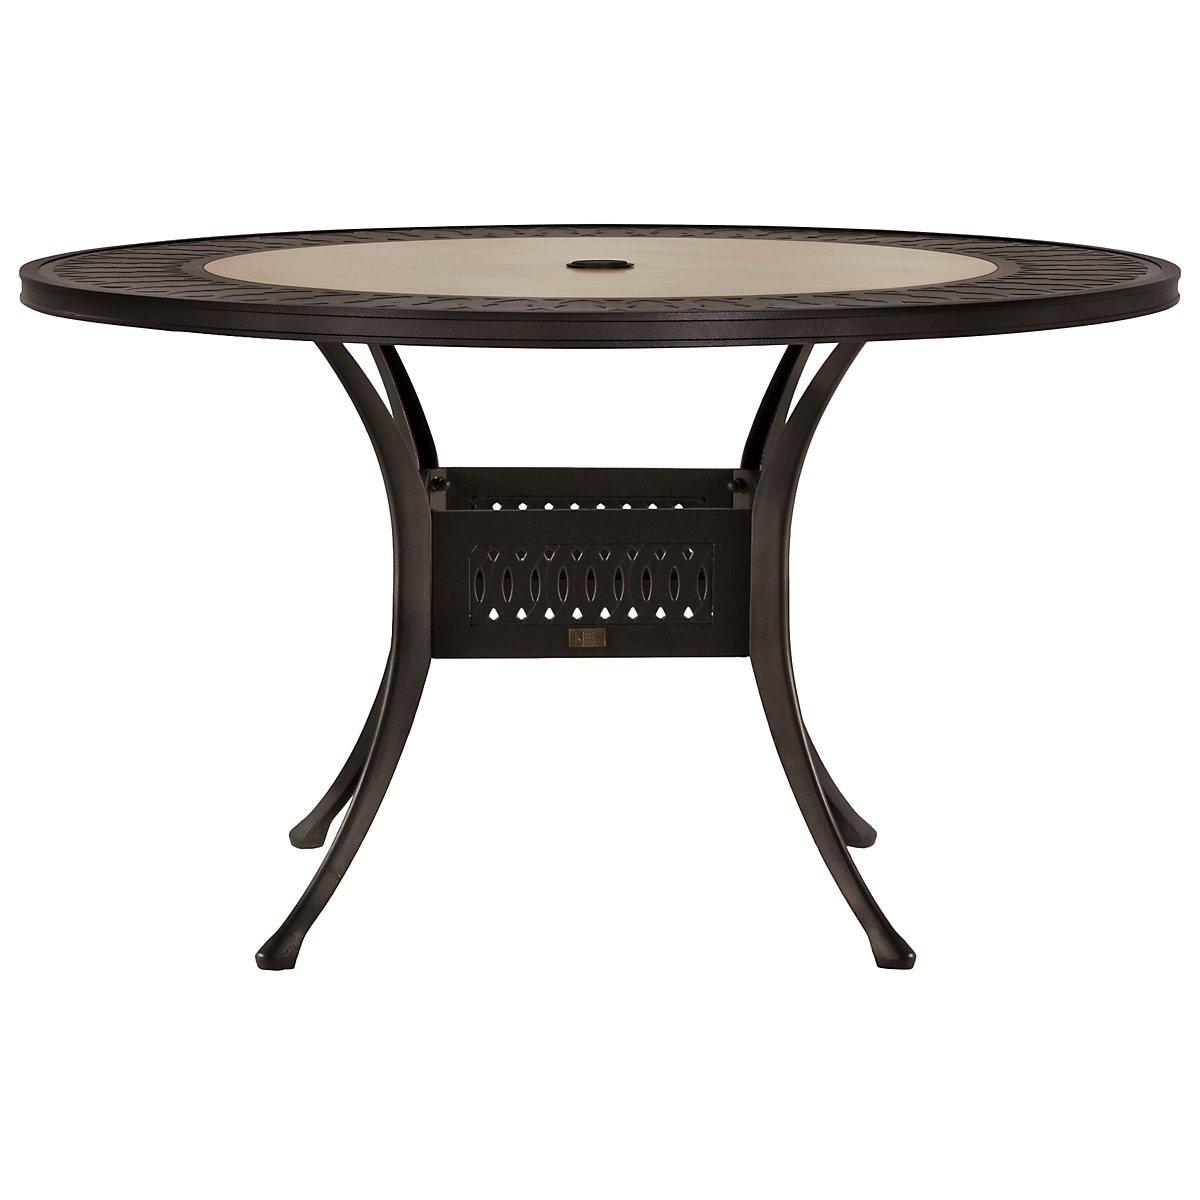 "Primera Stone 54"" Round Table"